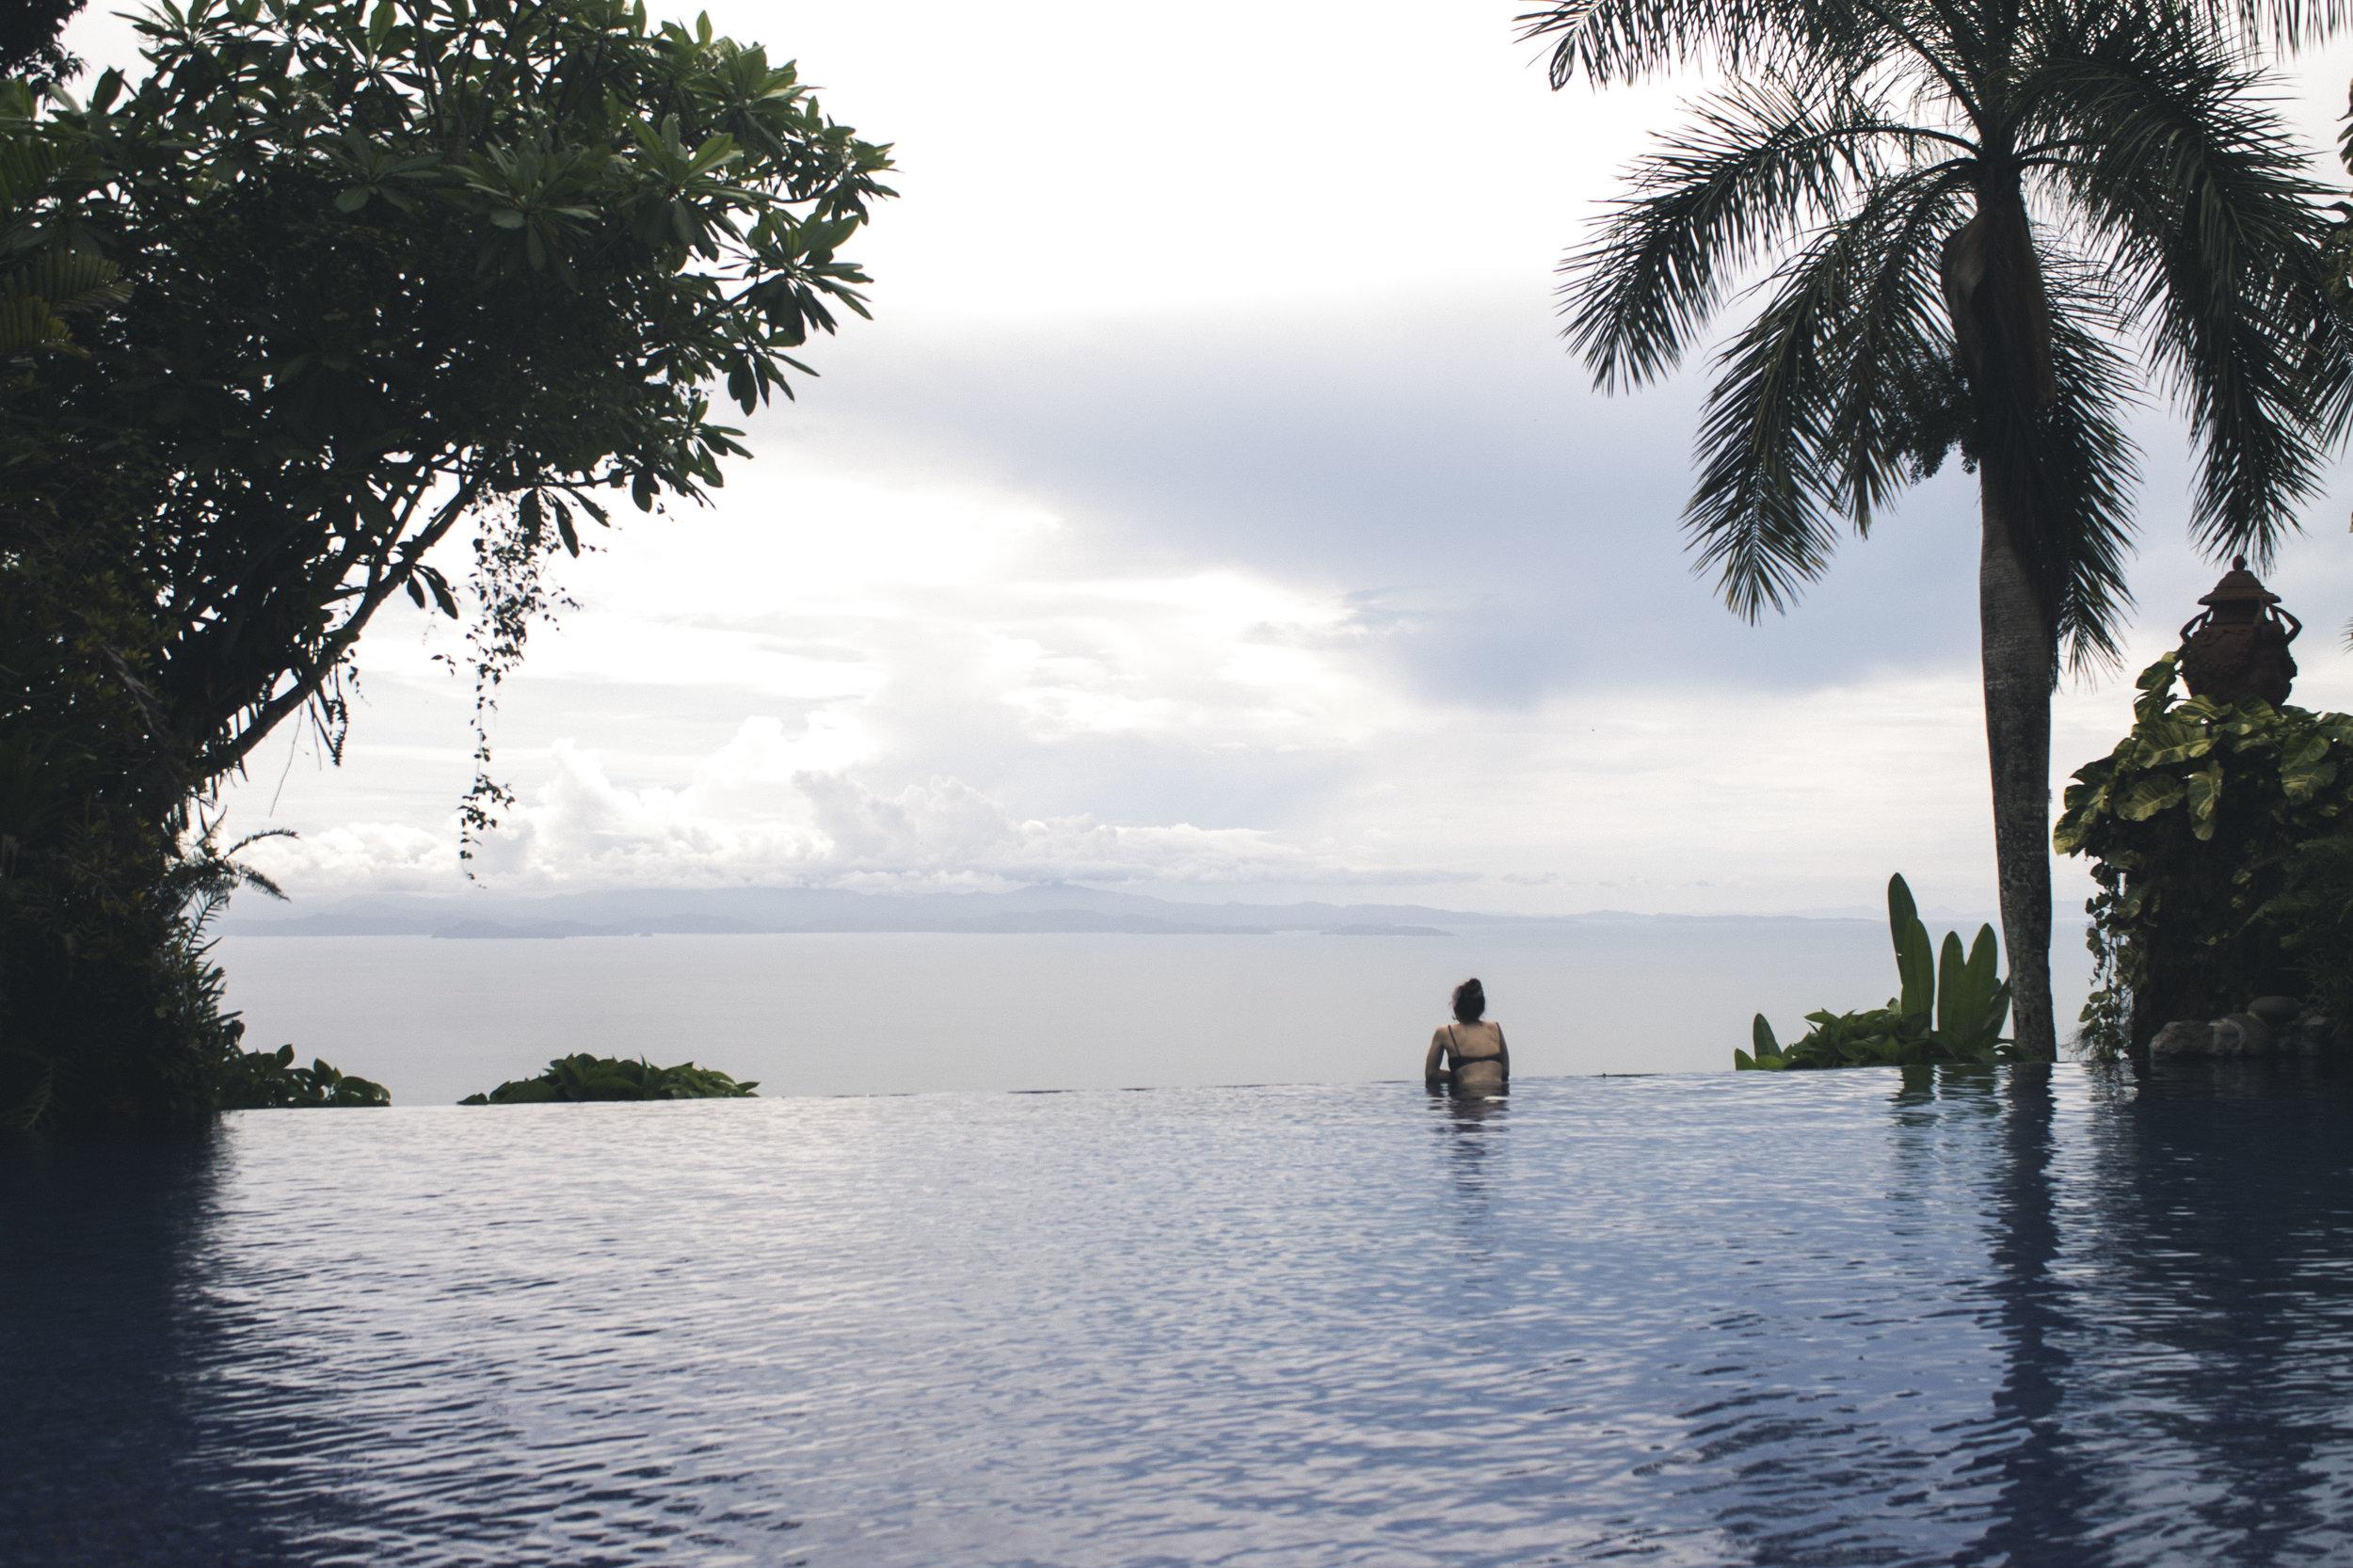 Infinity pool at Villa Caletas in Jaco, Costa Rica